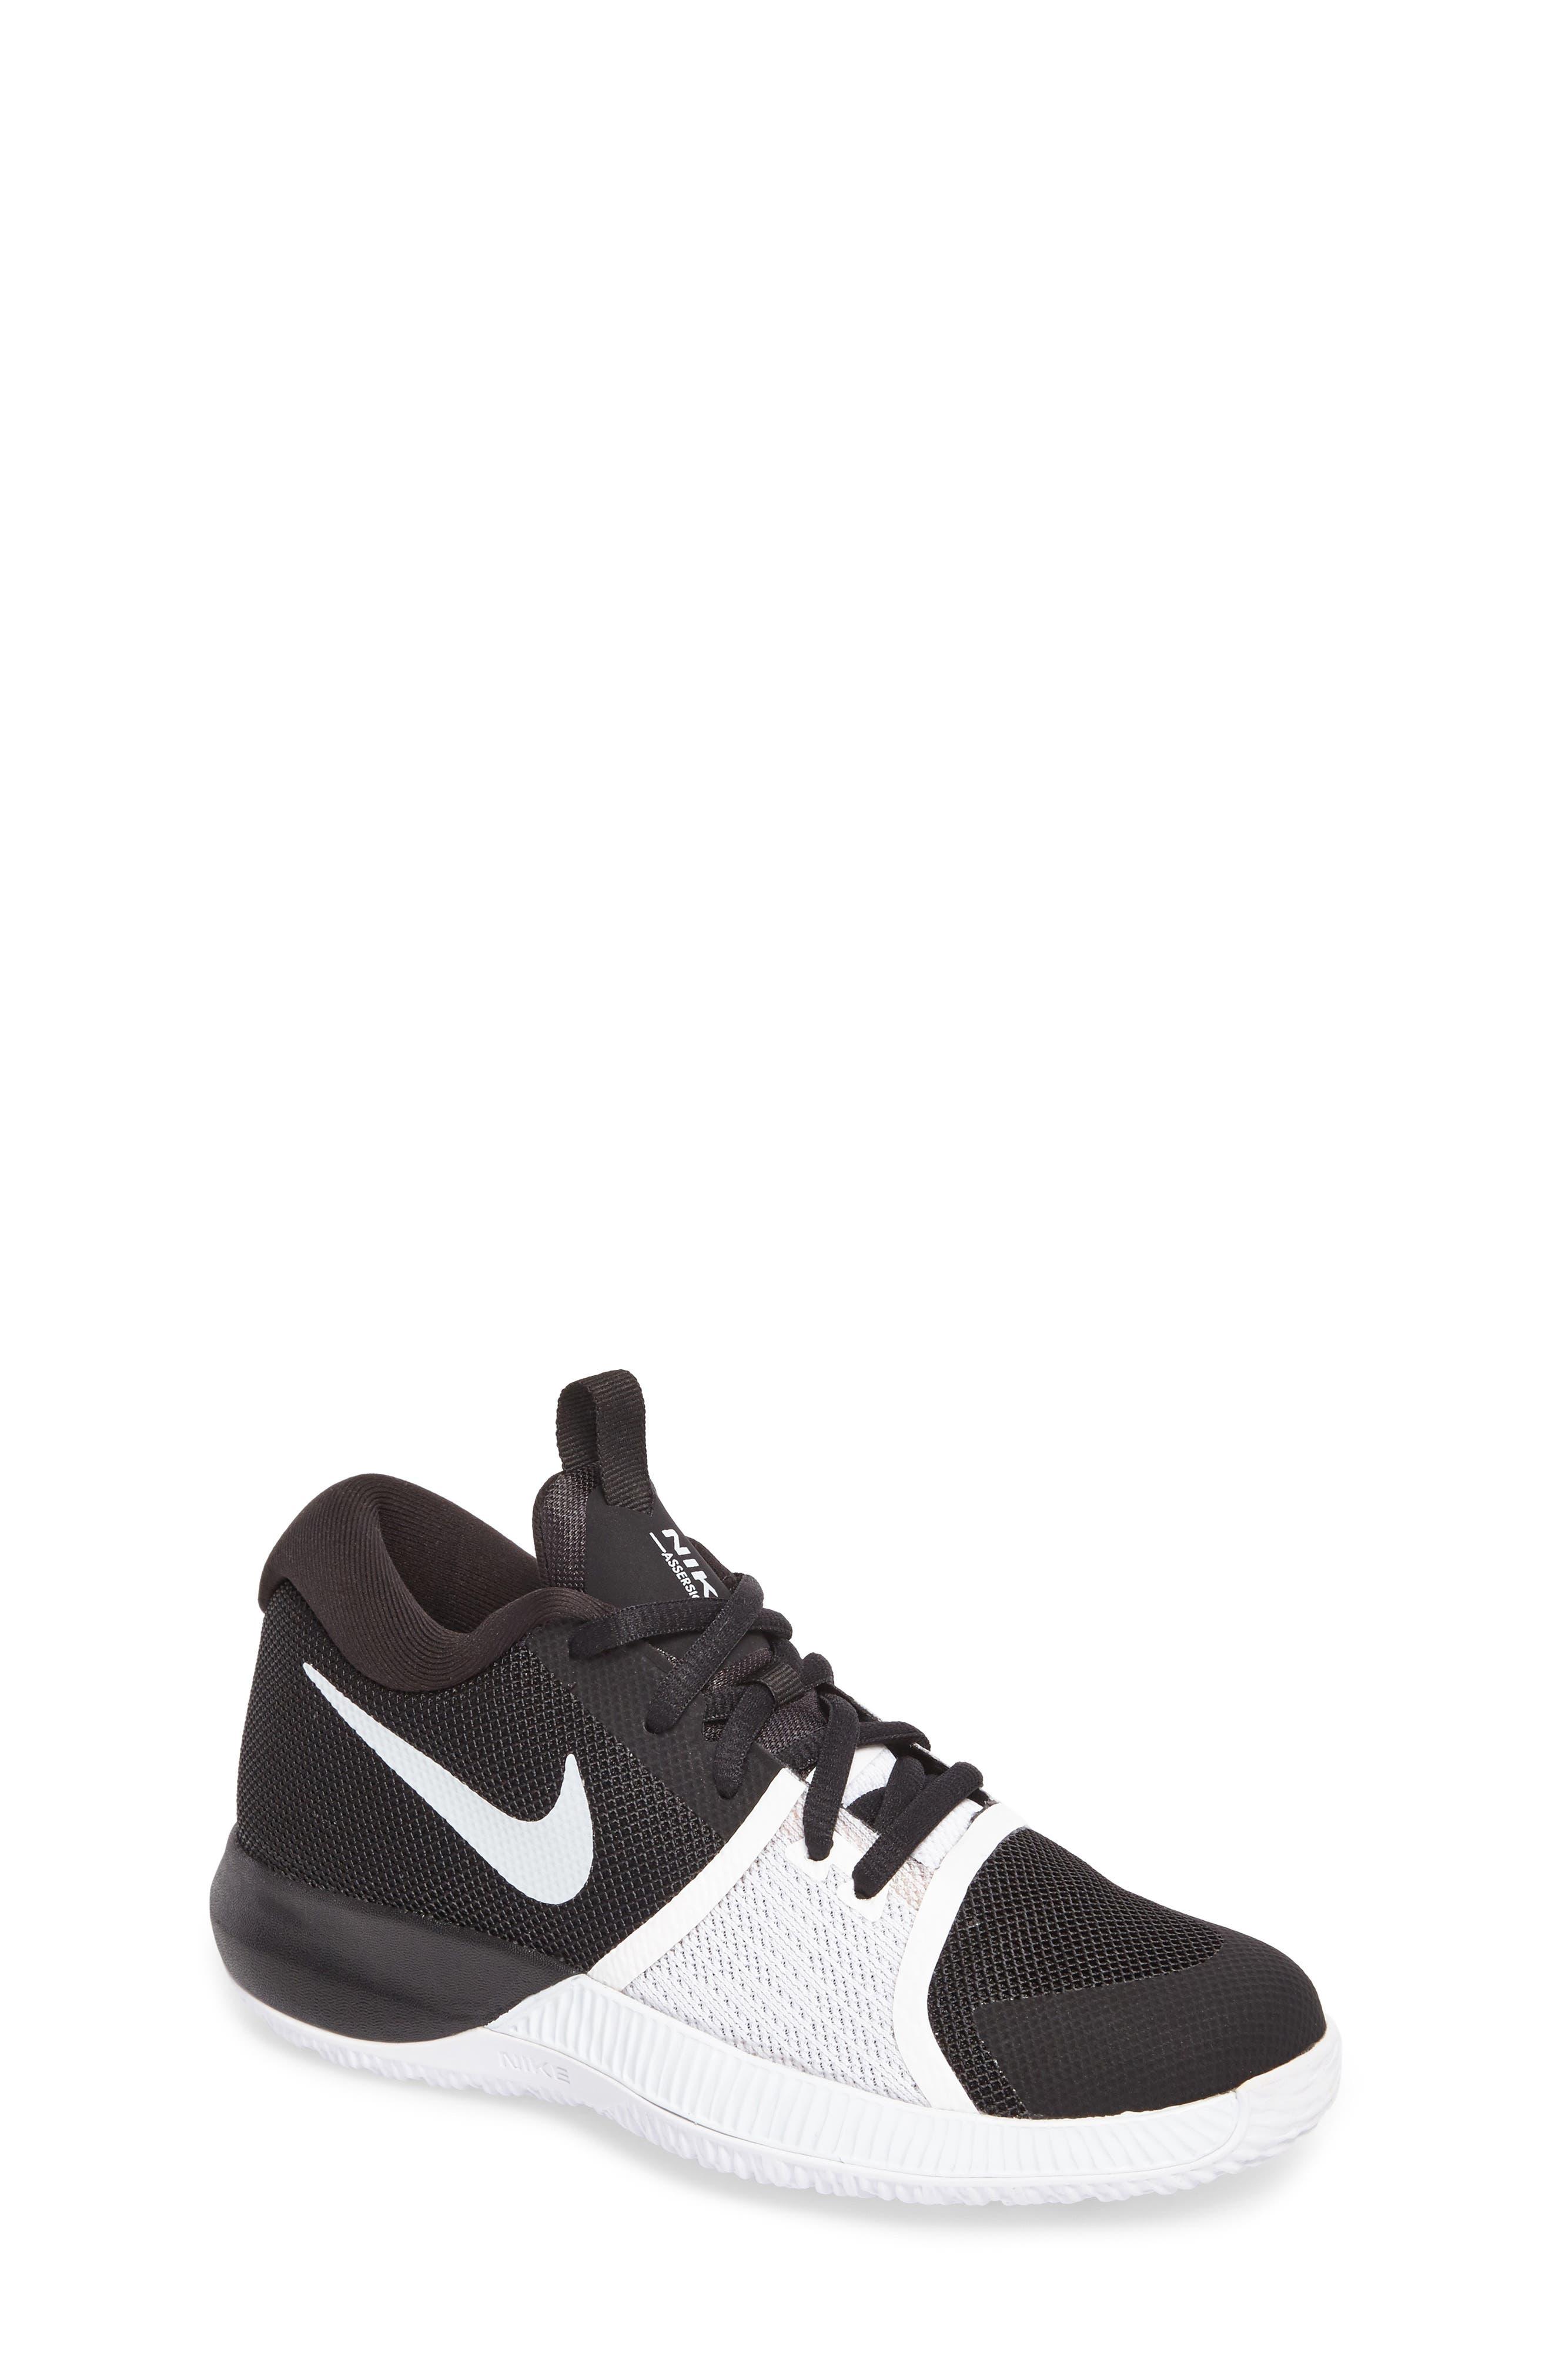 Assersion Sneaker,                             Main thumbnail 1, color,                             005